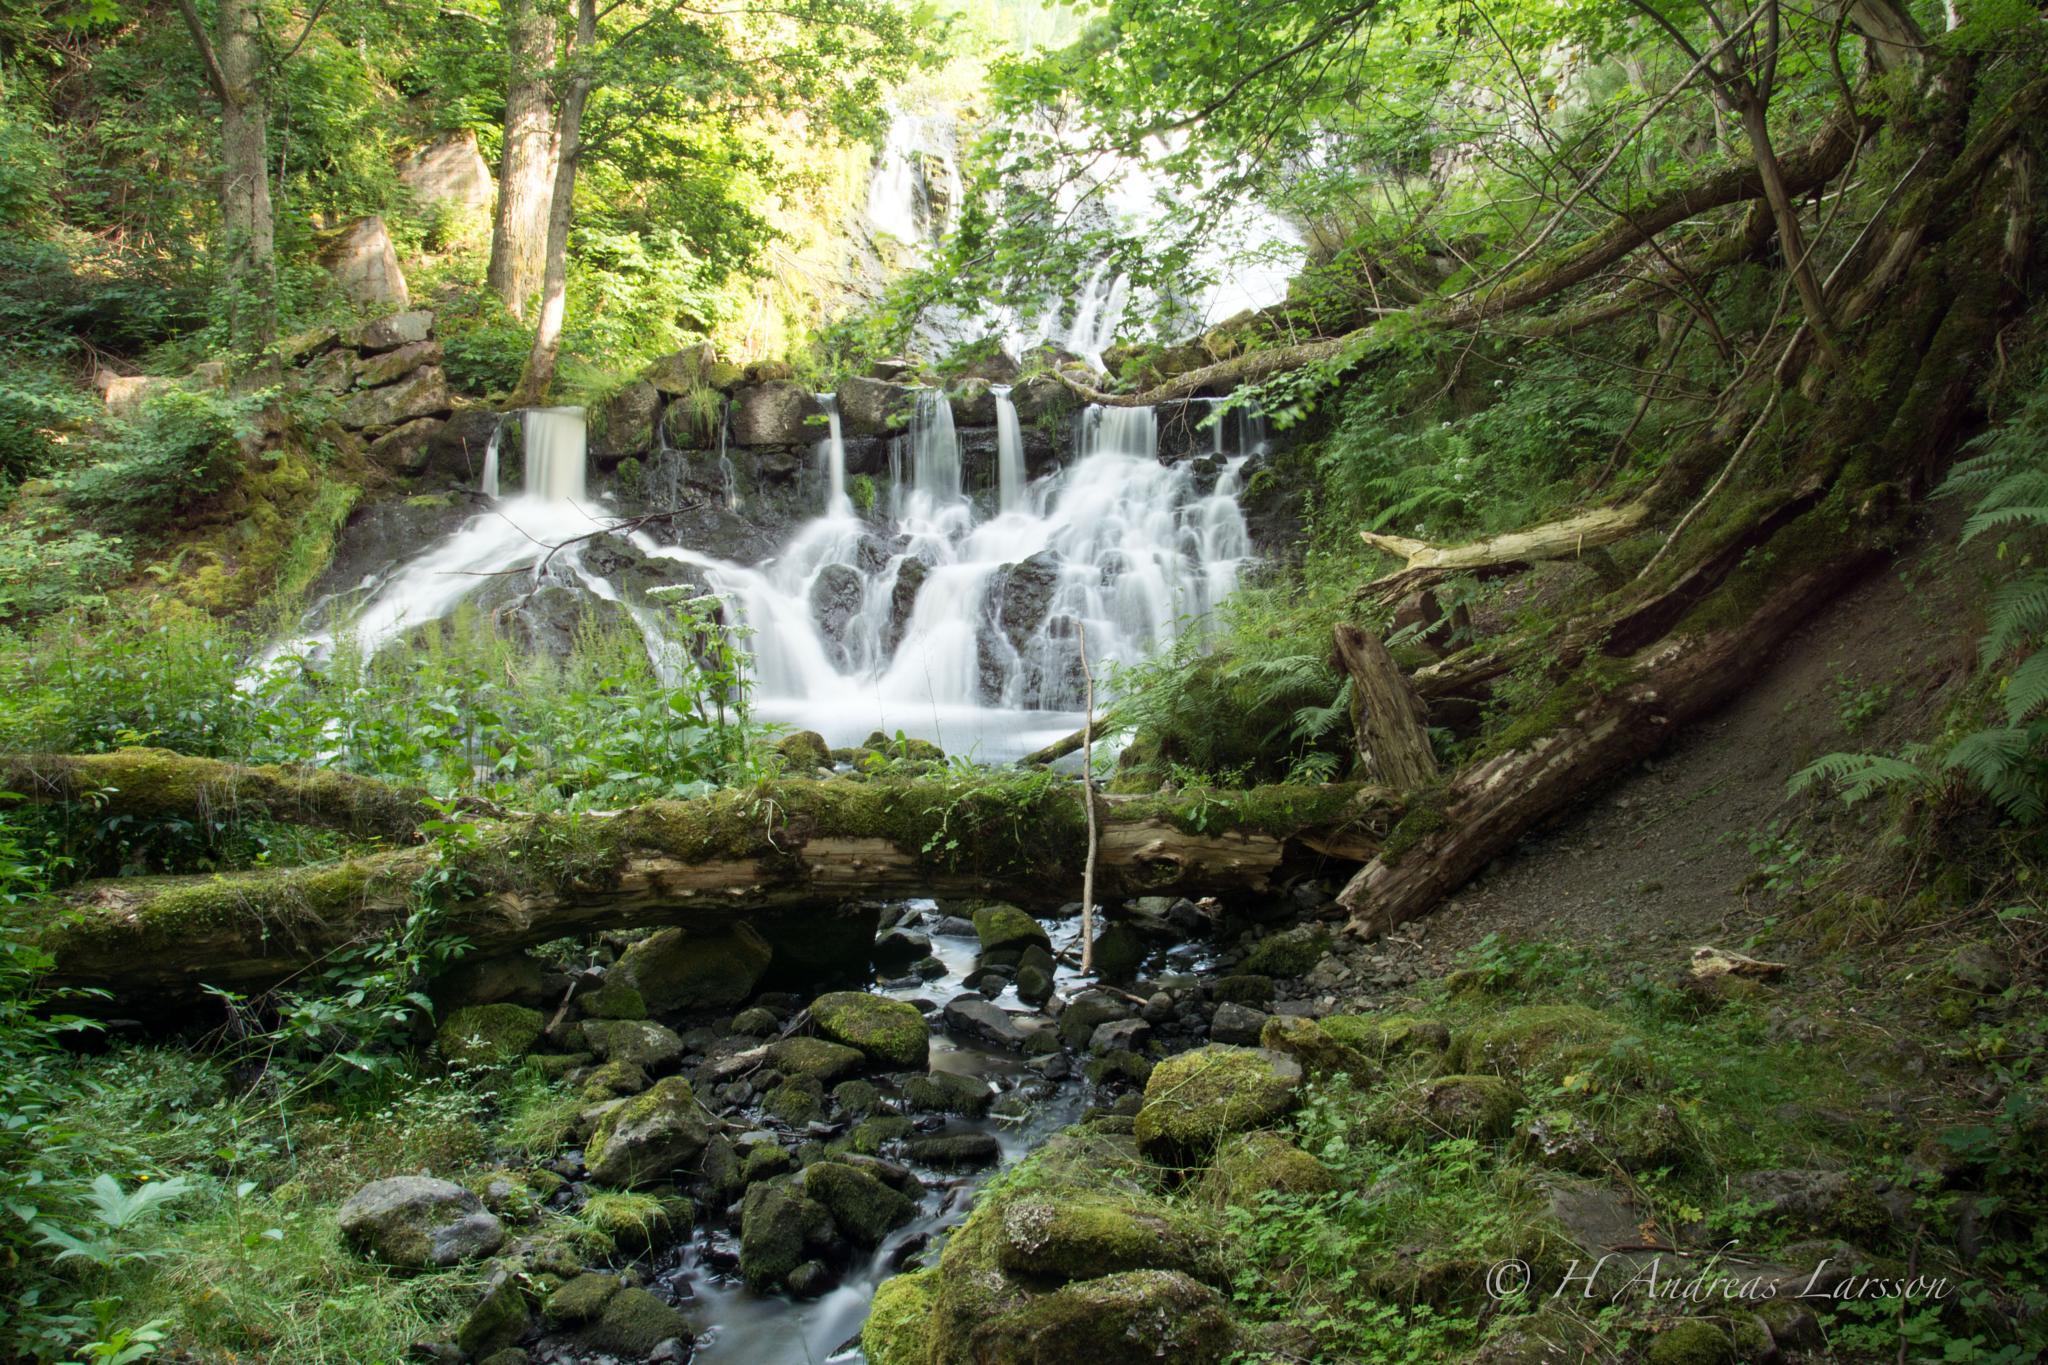 Röttle village waterfall 2 by Andreas Larsson